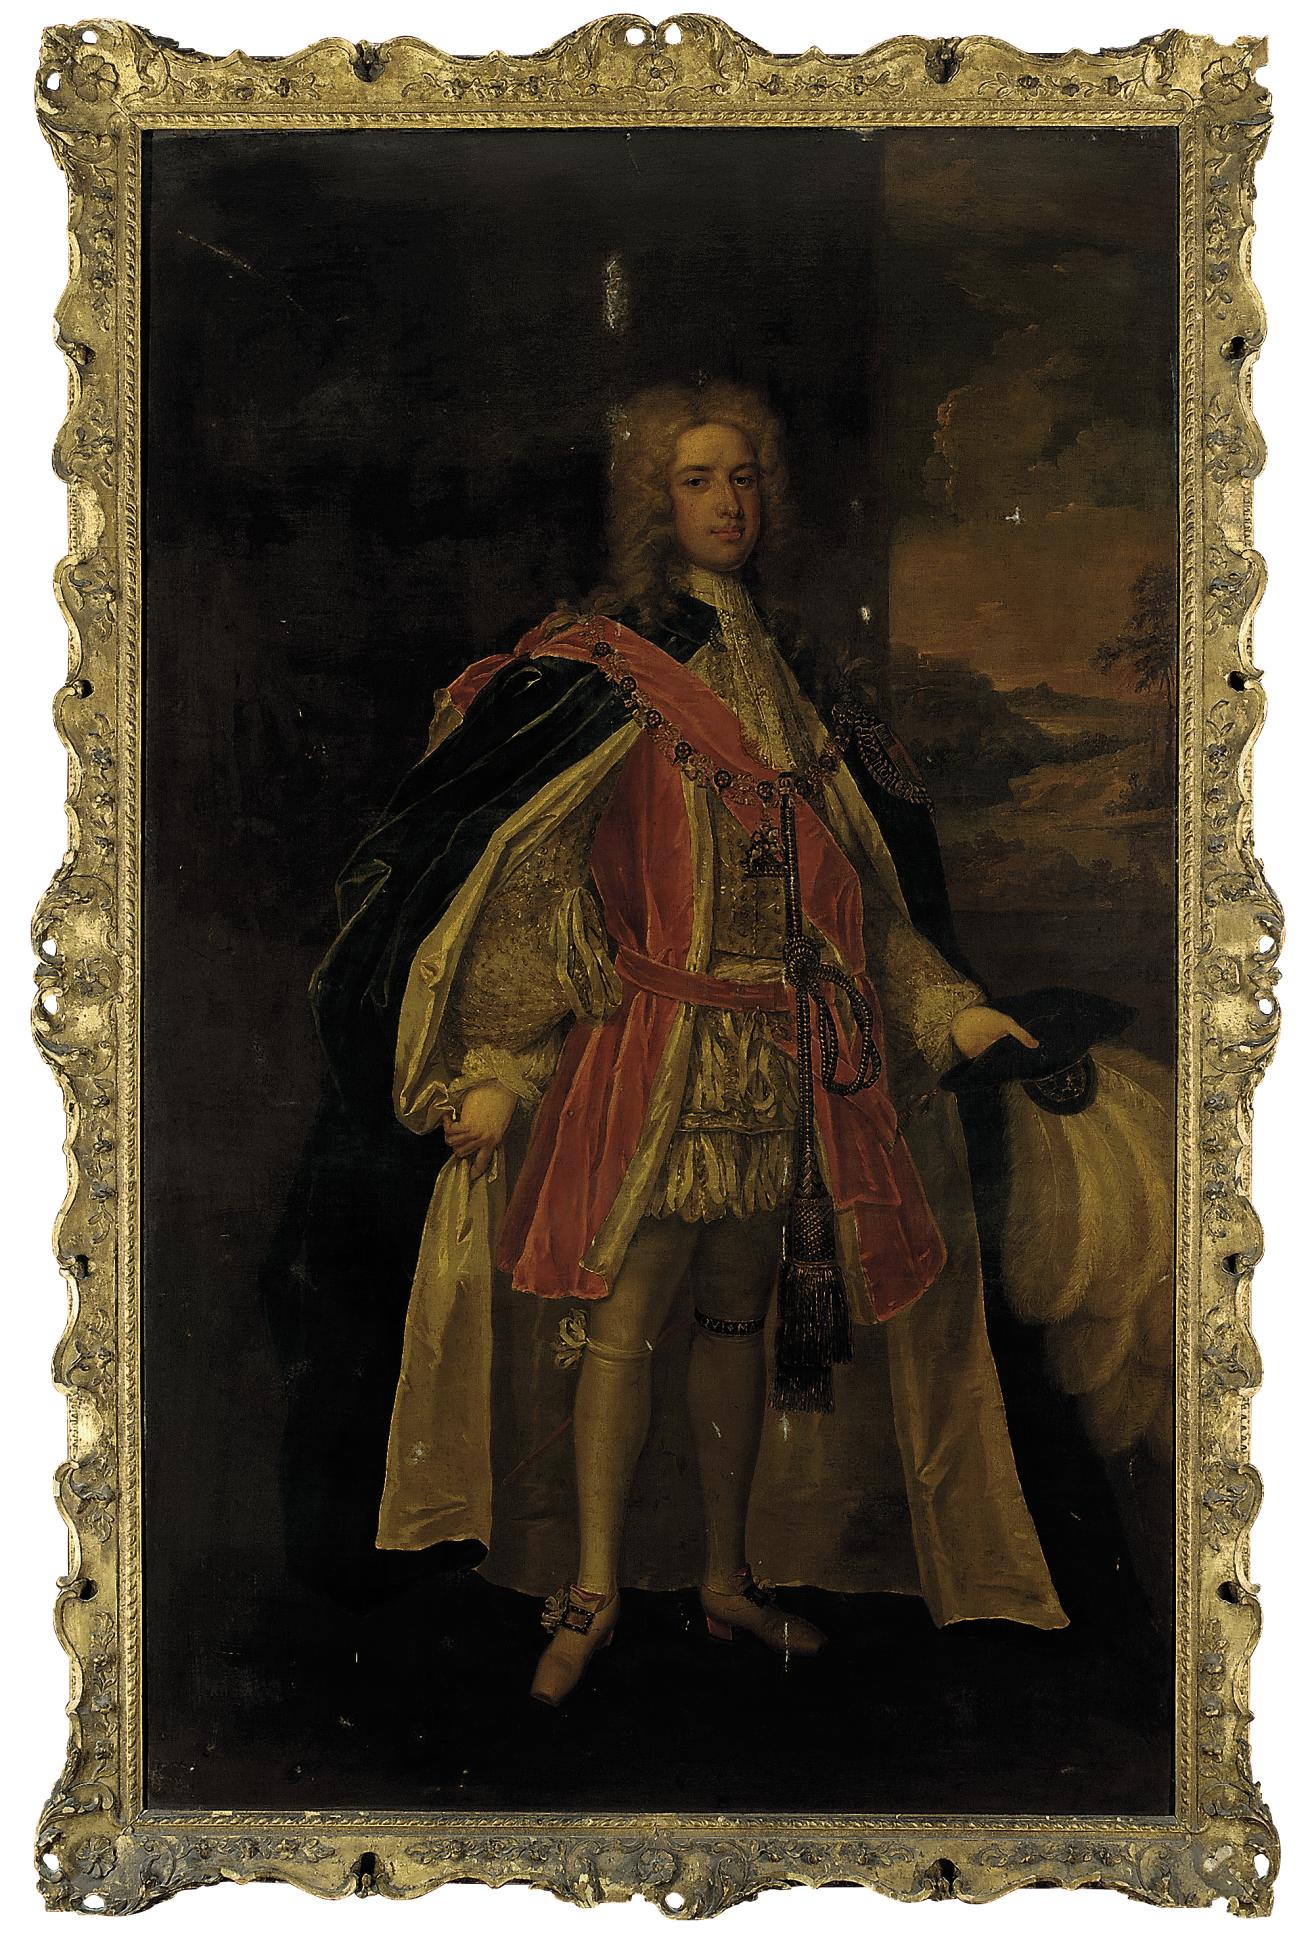 Portrait of Thomas Pelham-Holles, 1st Duke of Newcastle-upon-Tyne and 1st Duke of Newcastle-under-Lyne (1693-1768), full-length, in Garter robes, his hat in his left hand, a landscape beyond